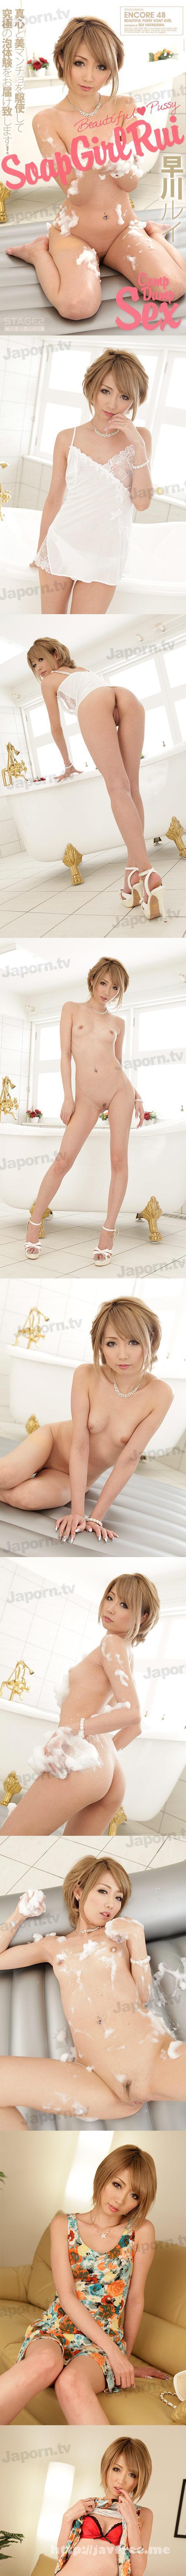 [S2M-048] アンコール Vol.48 Soap Girl Rui : 早川ルイ - image S2M-048_1 on https://javfree.me